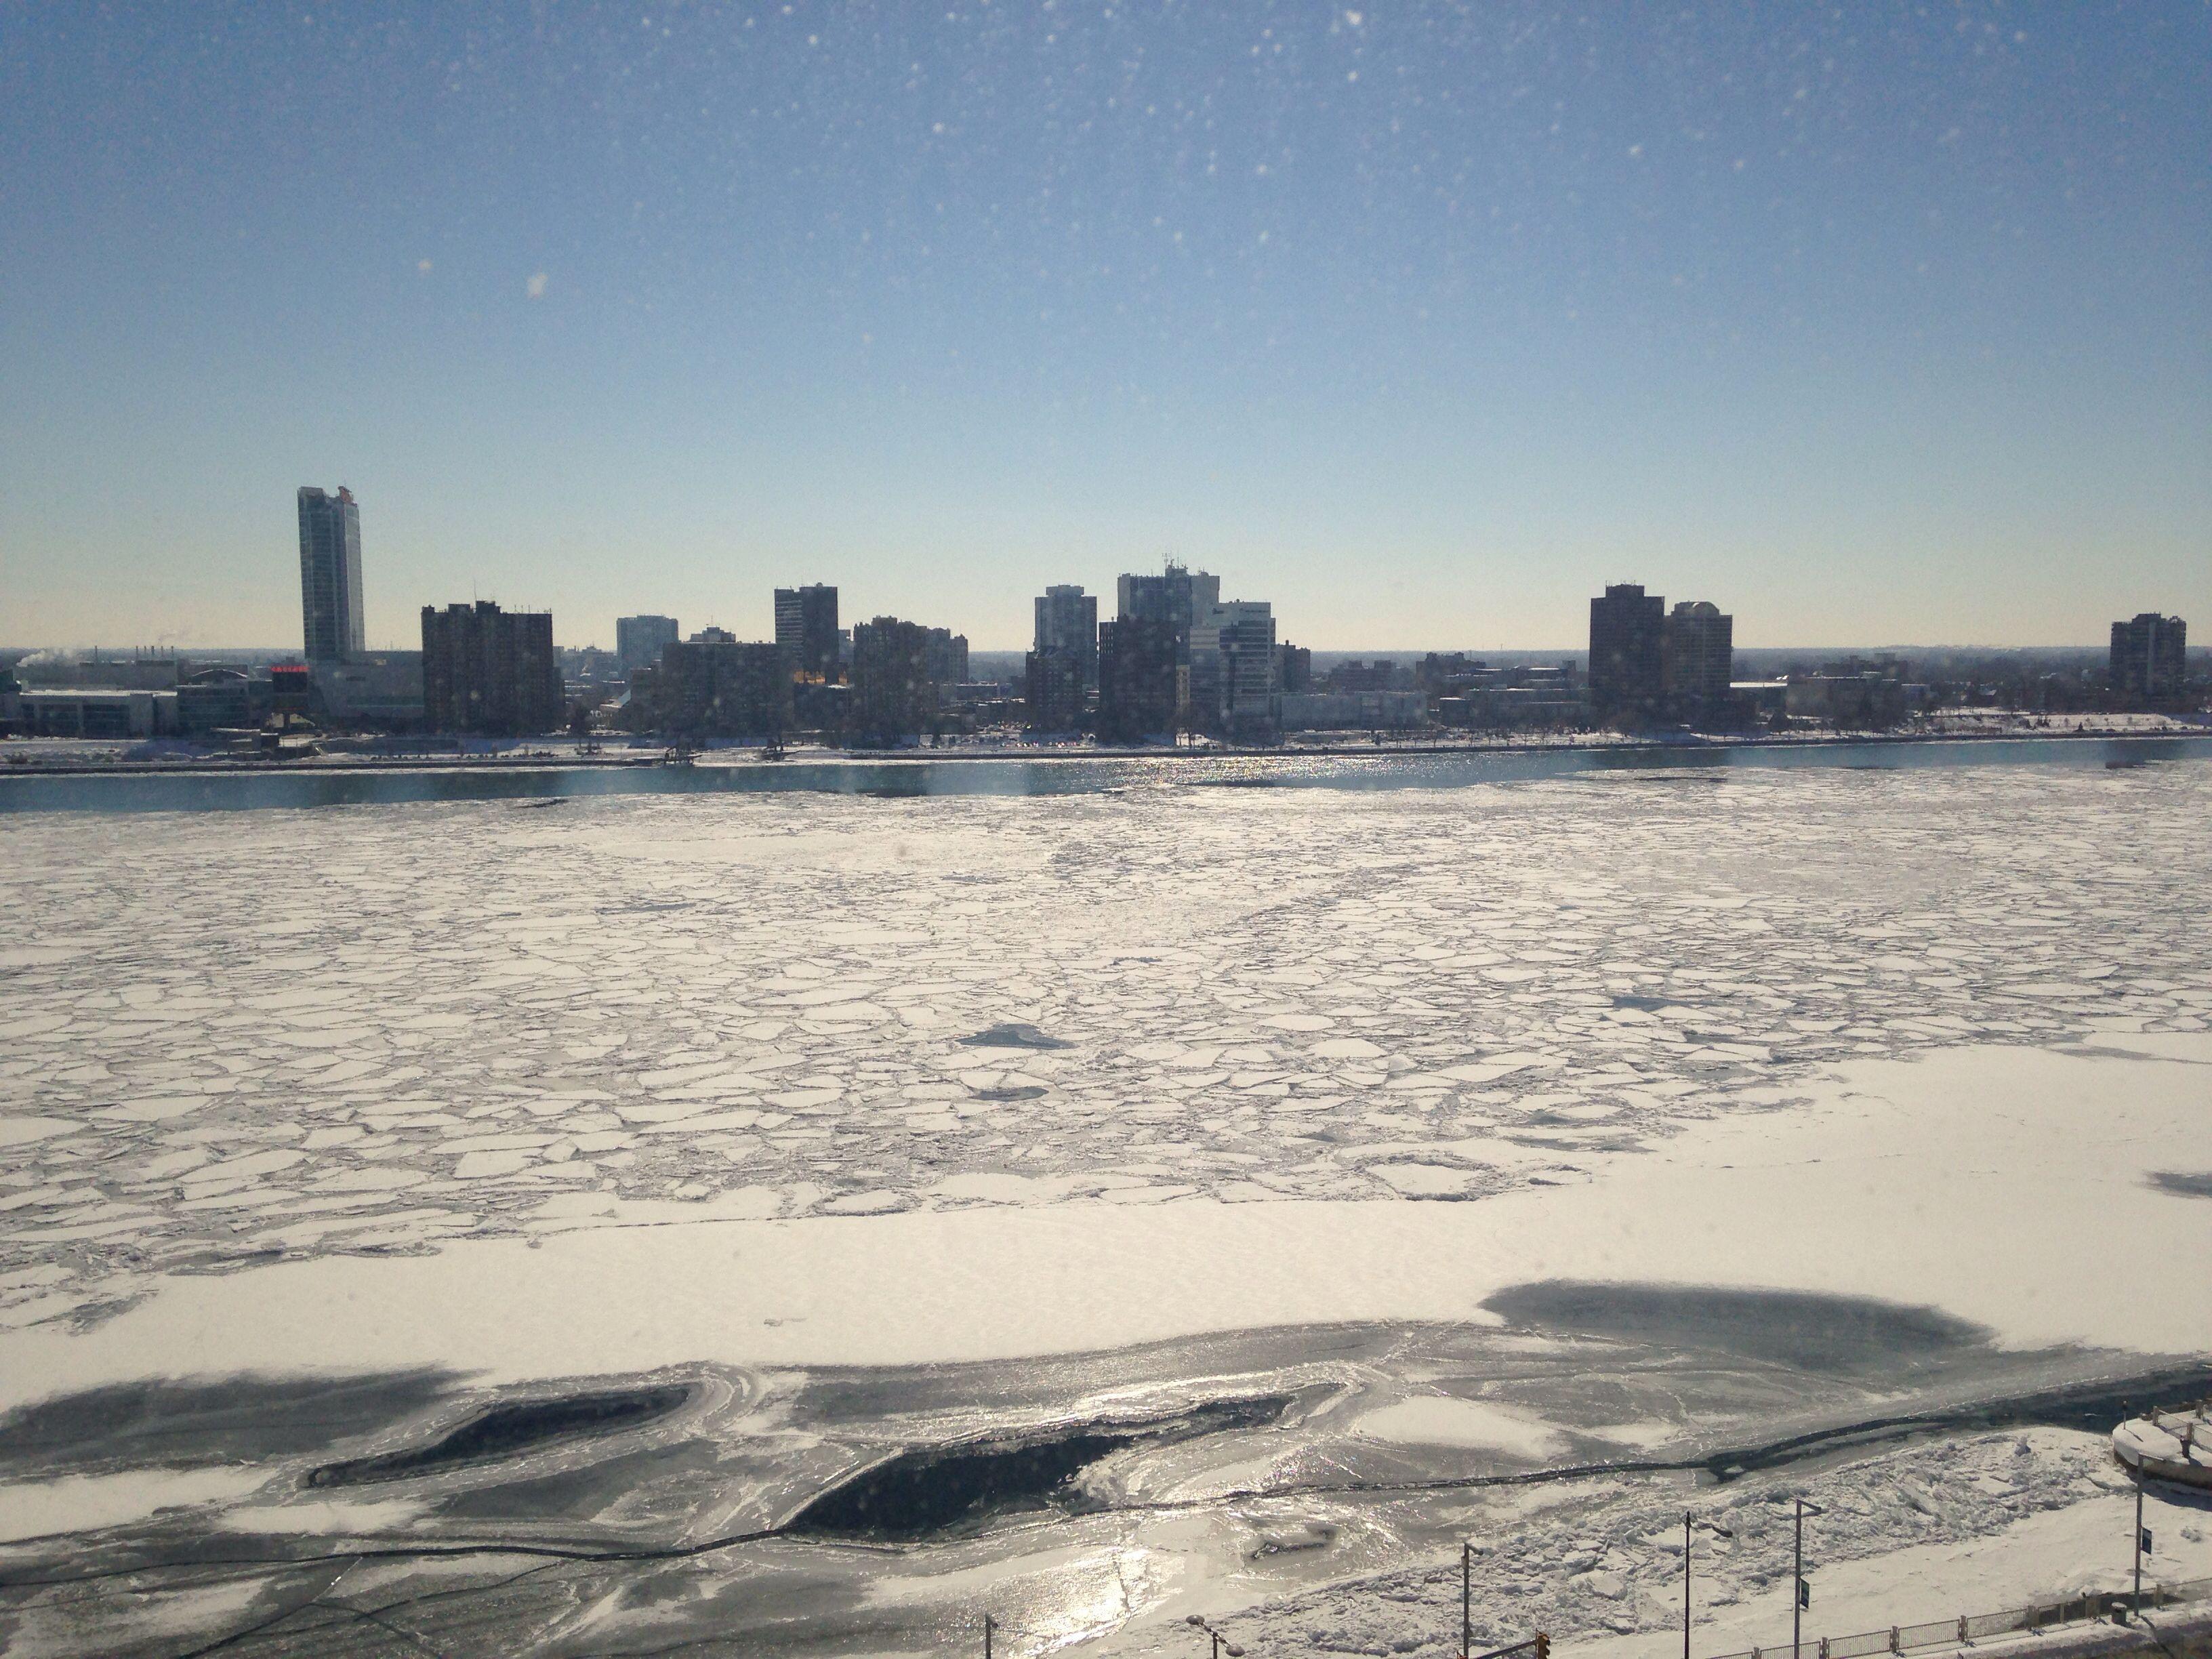 Detroit river - Canada